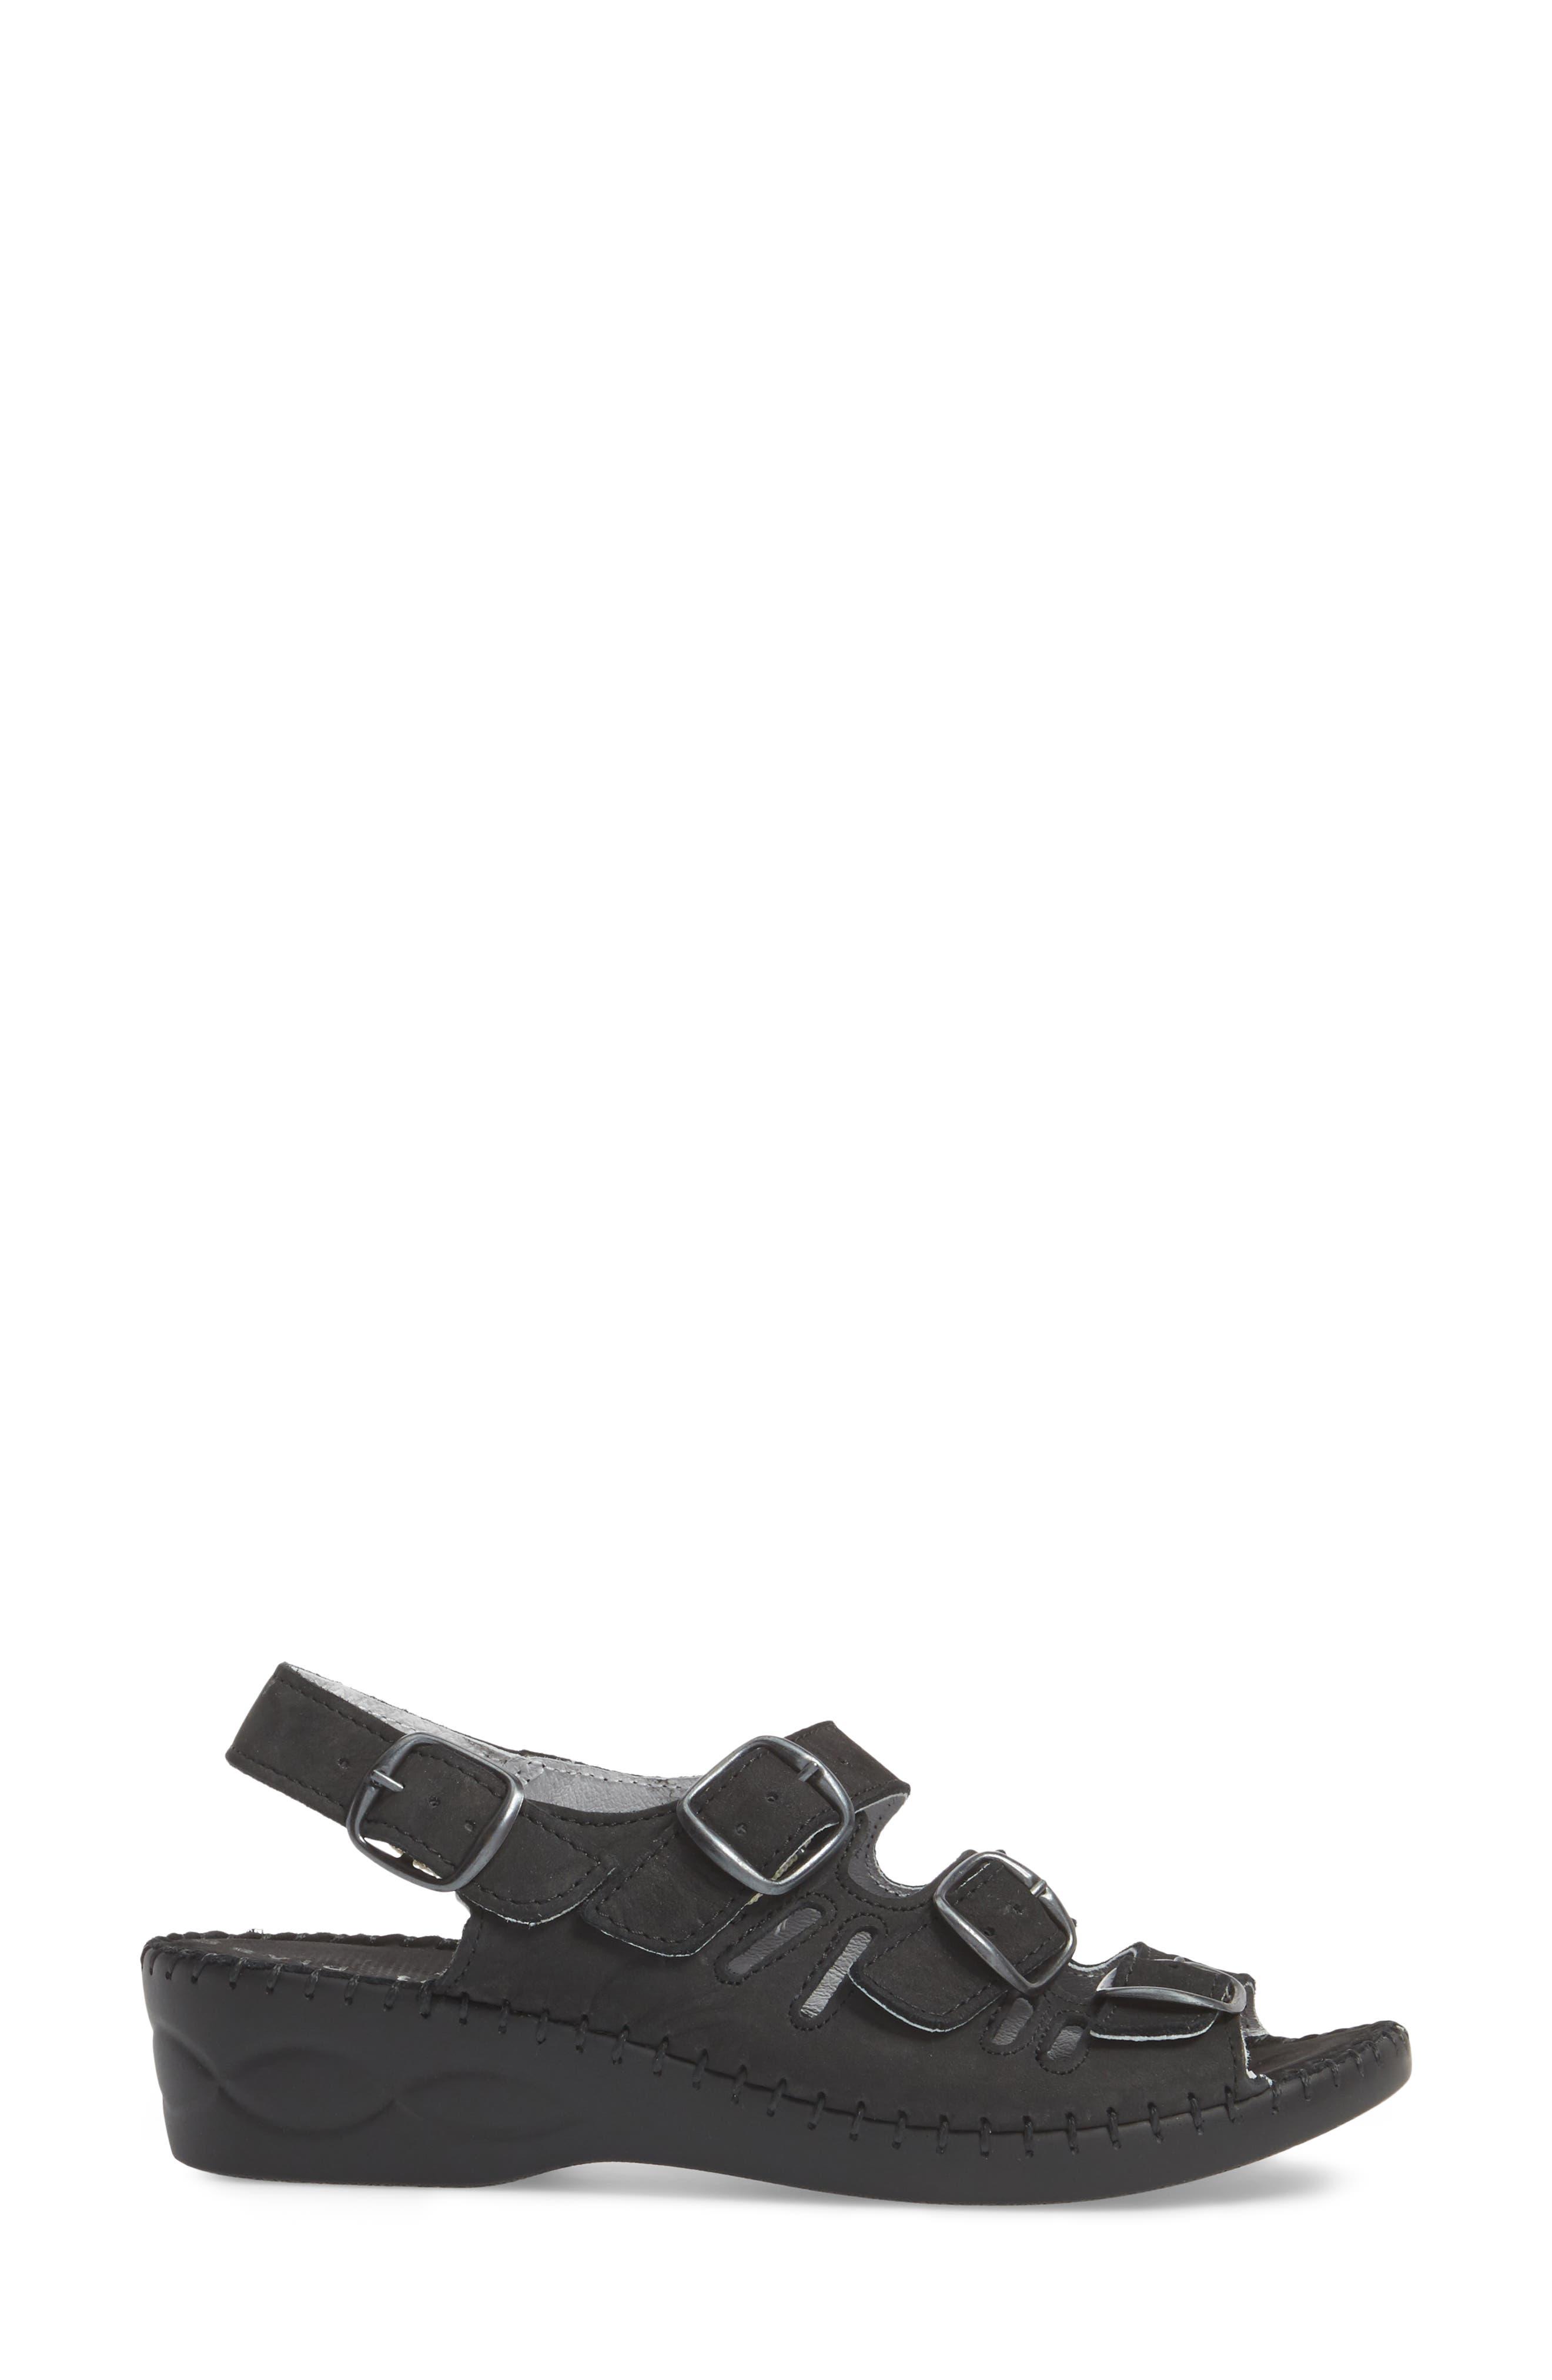 Luna Slingback Wedge Sandal,                             Alternate thumbnail 3, color,                             BLACK NUBUCK